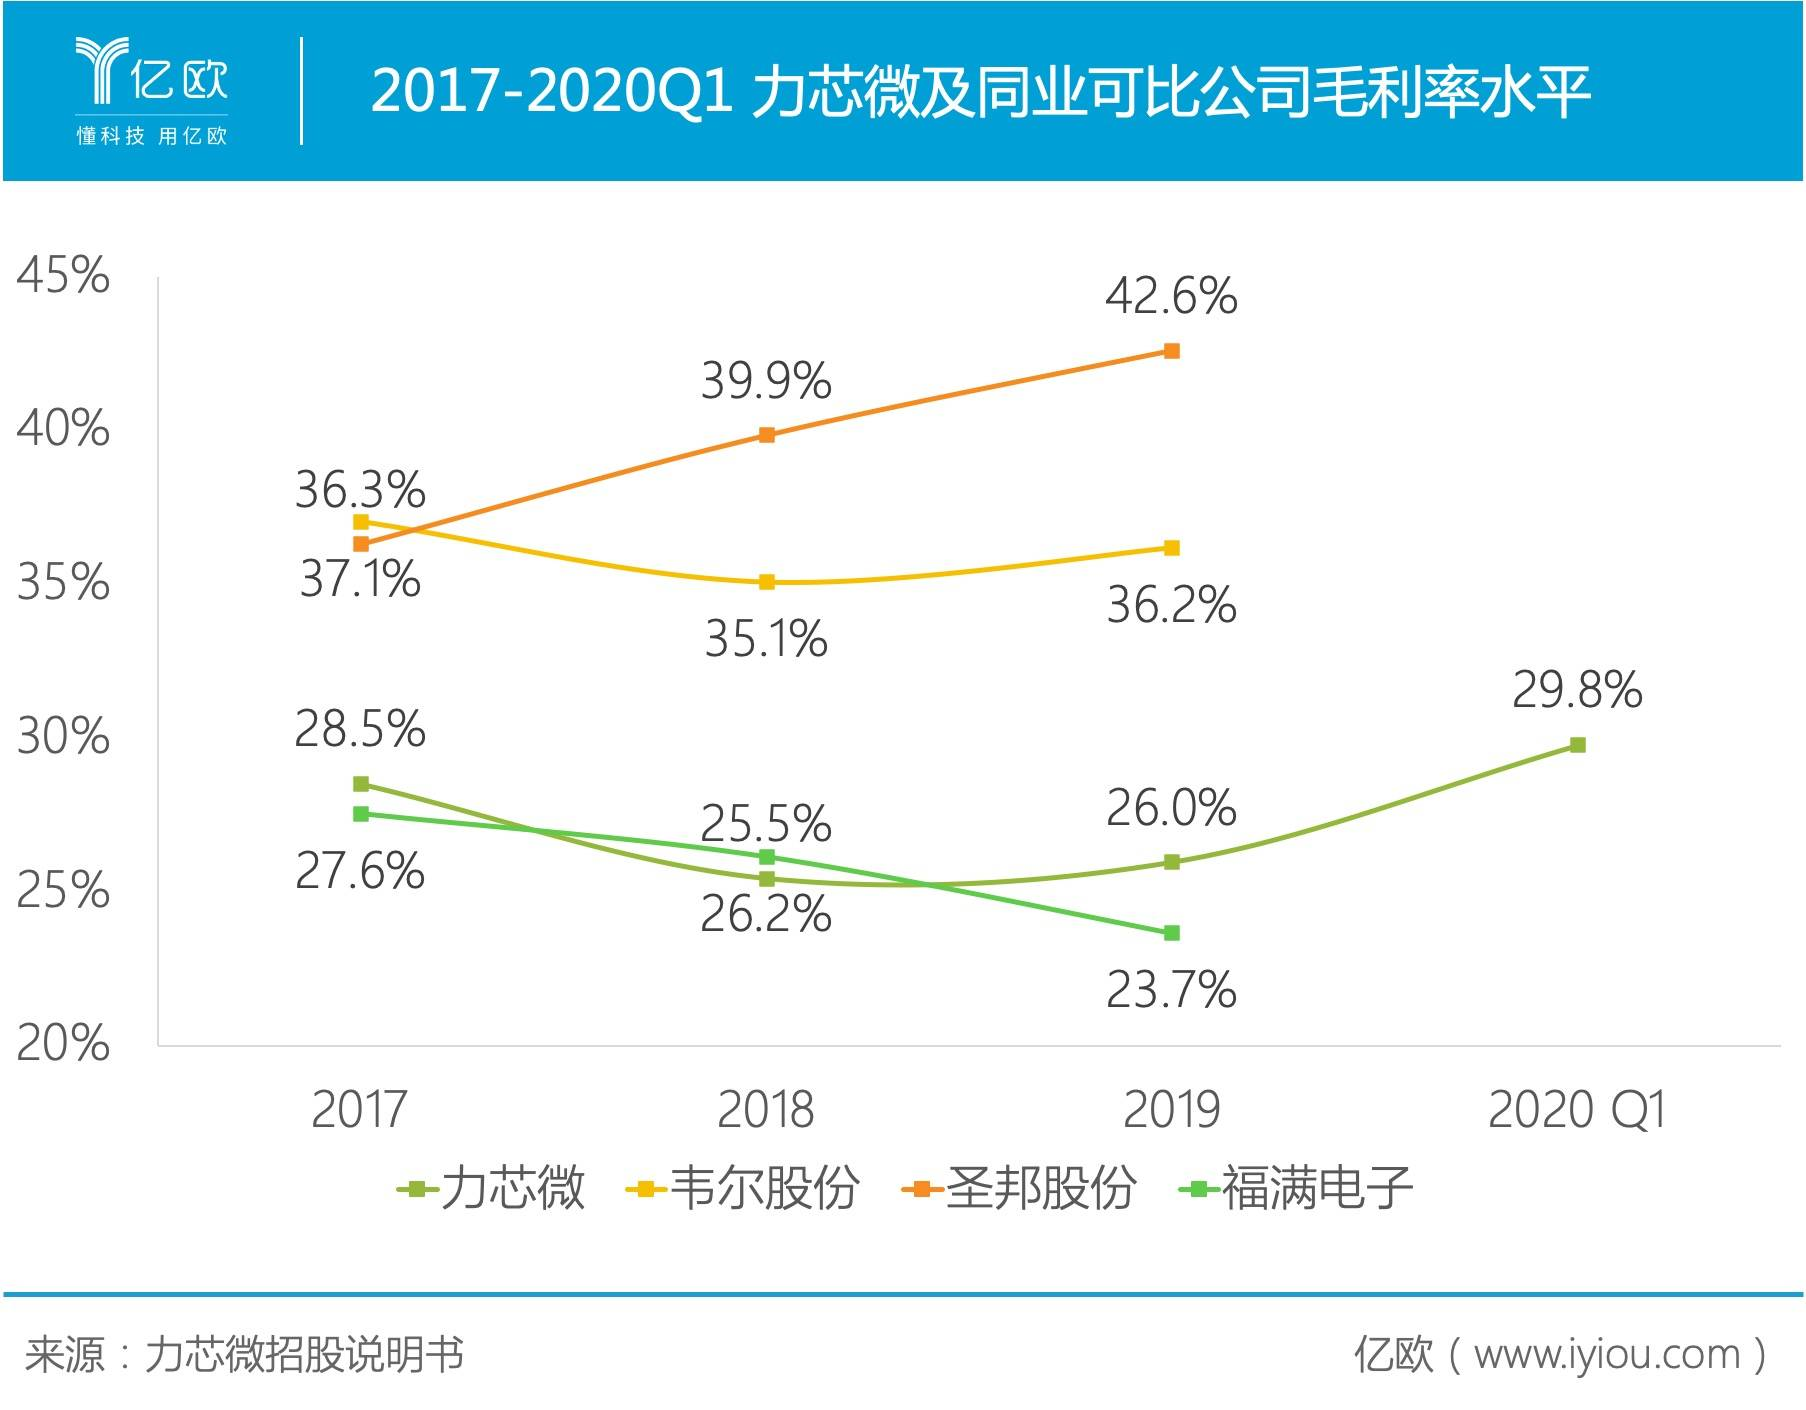 2017-2020Q1 力芯微及同业可比公司毛利率水平..PNG